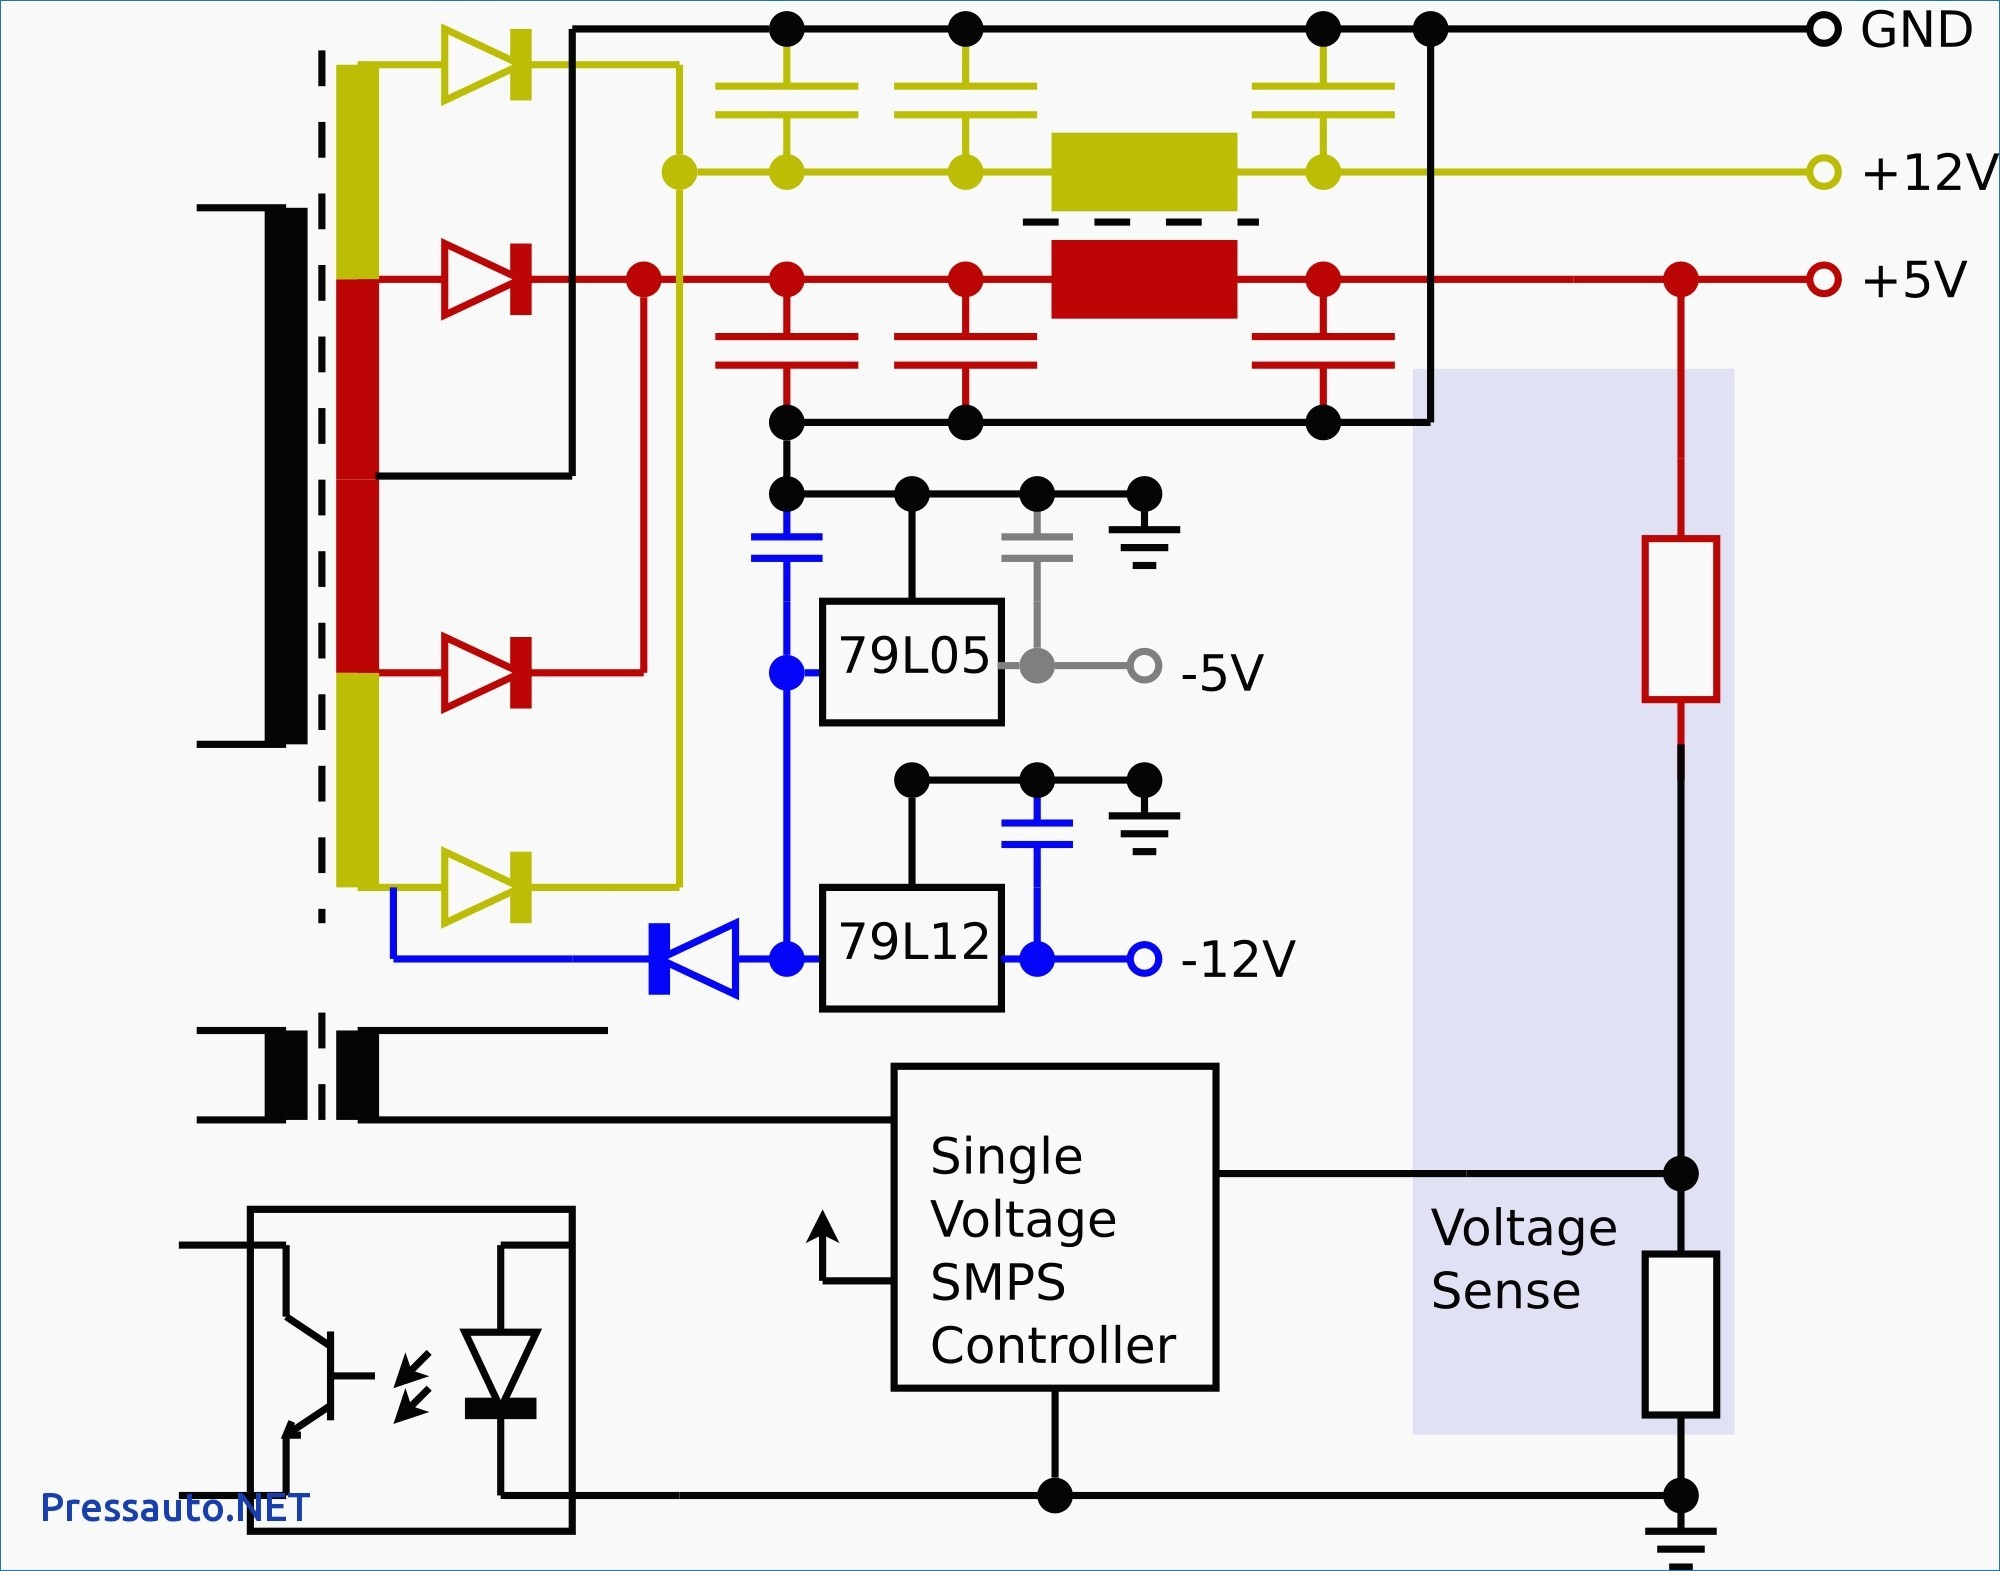 hight resolution of 24v transformer wiring diagram dayton contactors phase 5th power converter for 12v 480v